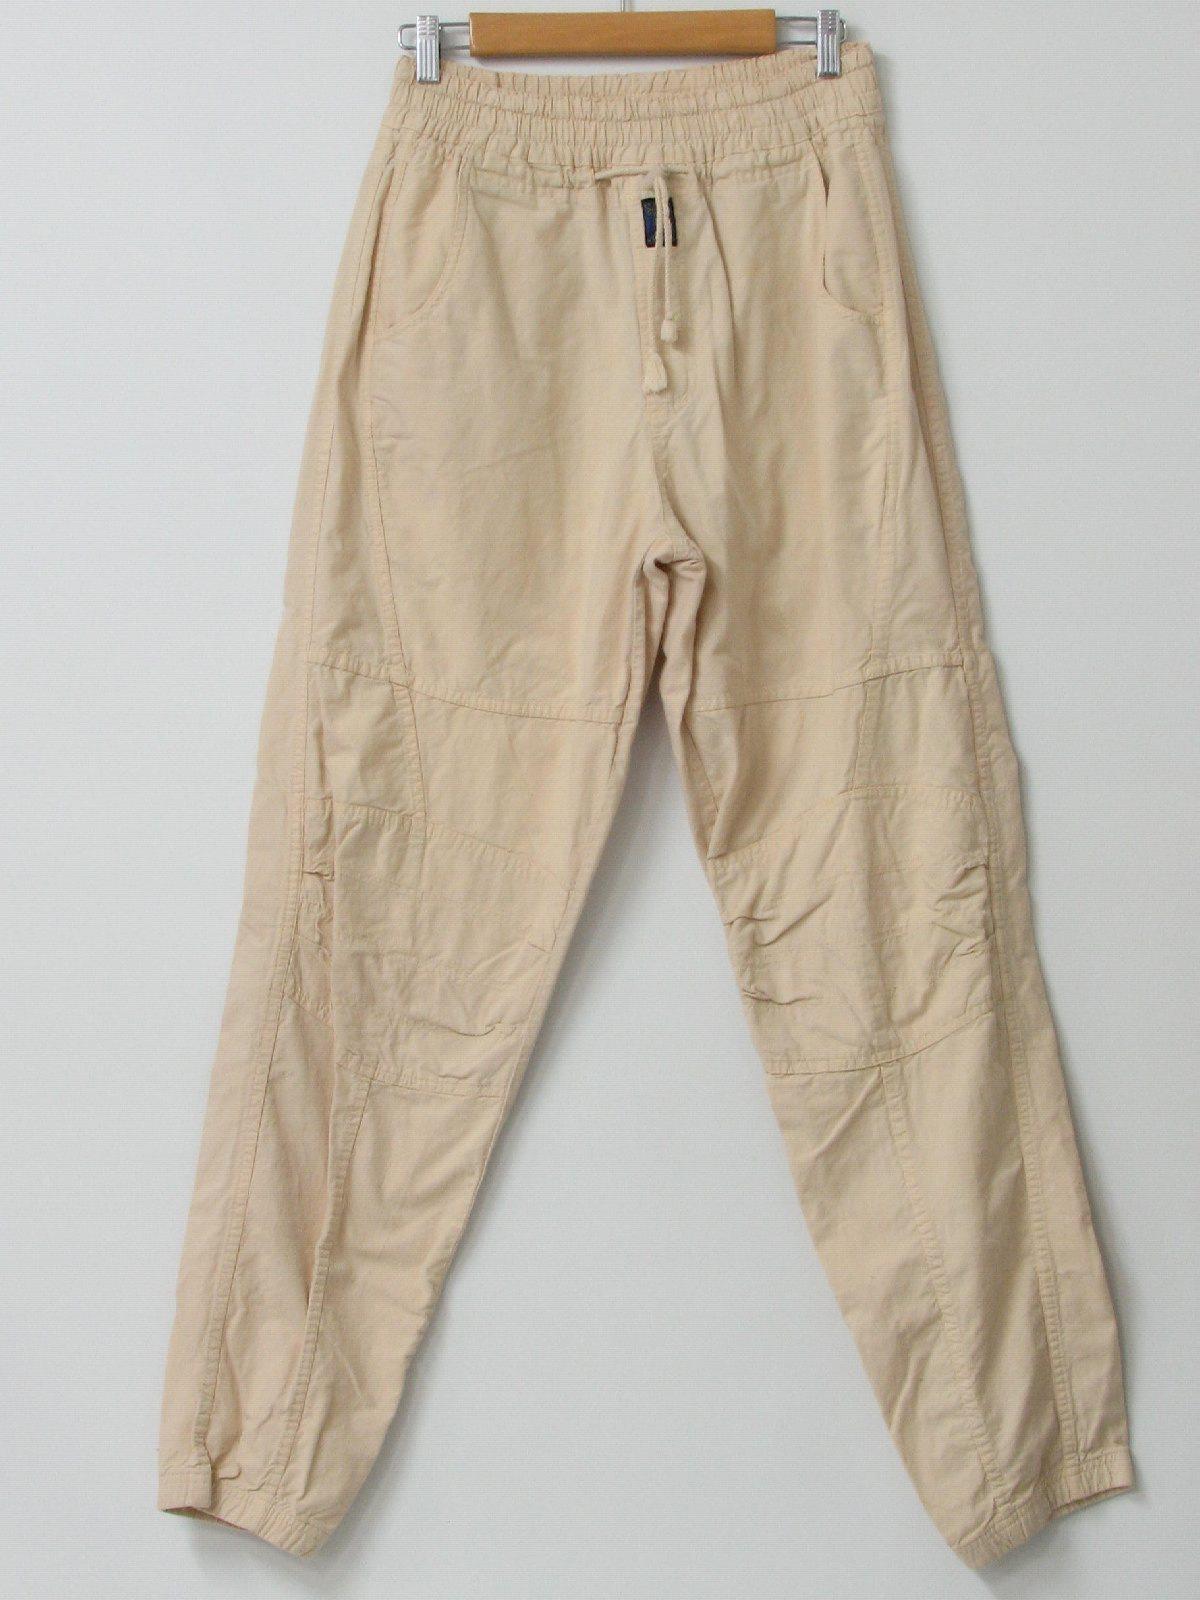 Nineties Vintage Pants: 90s -Buggle Boy- Mens khaki tan thick ...